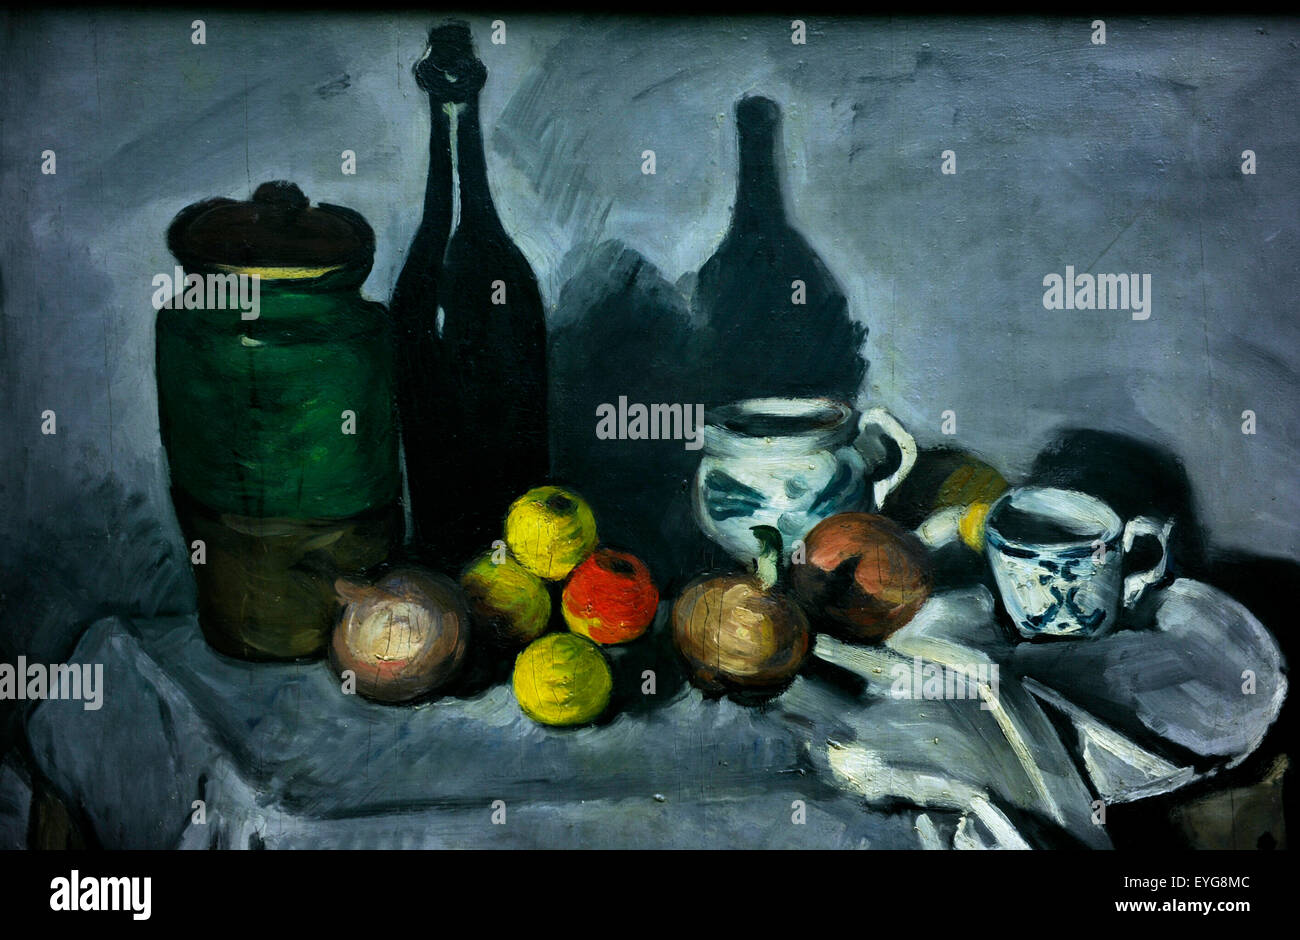 Paul CŽzanne 'Still Life with Fruit and Crockery' - Stock Image